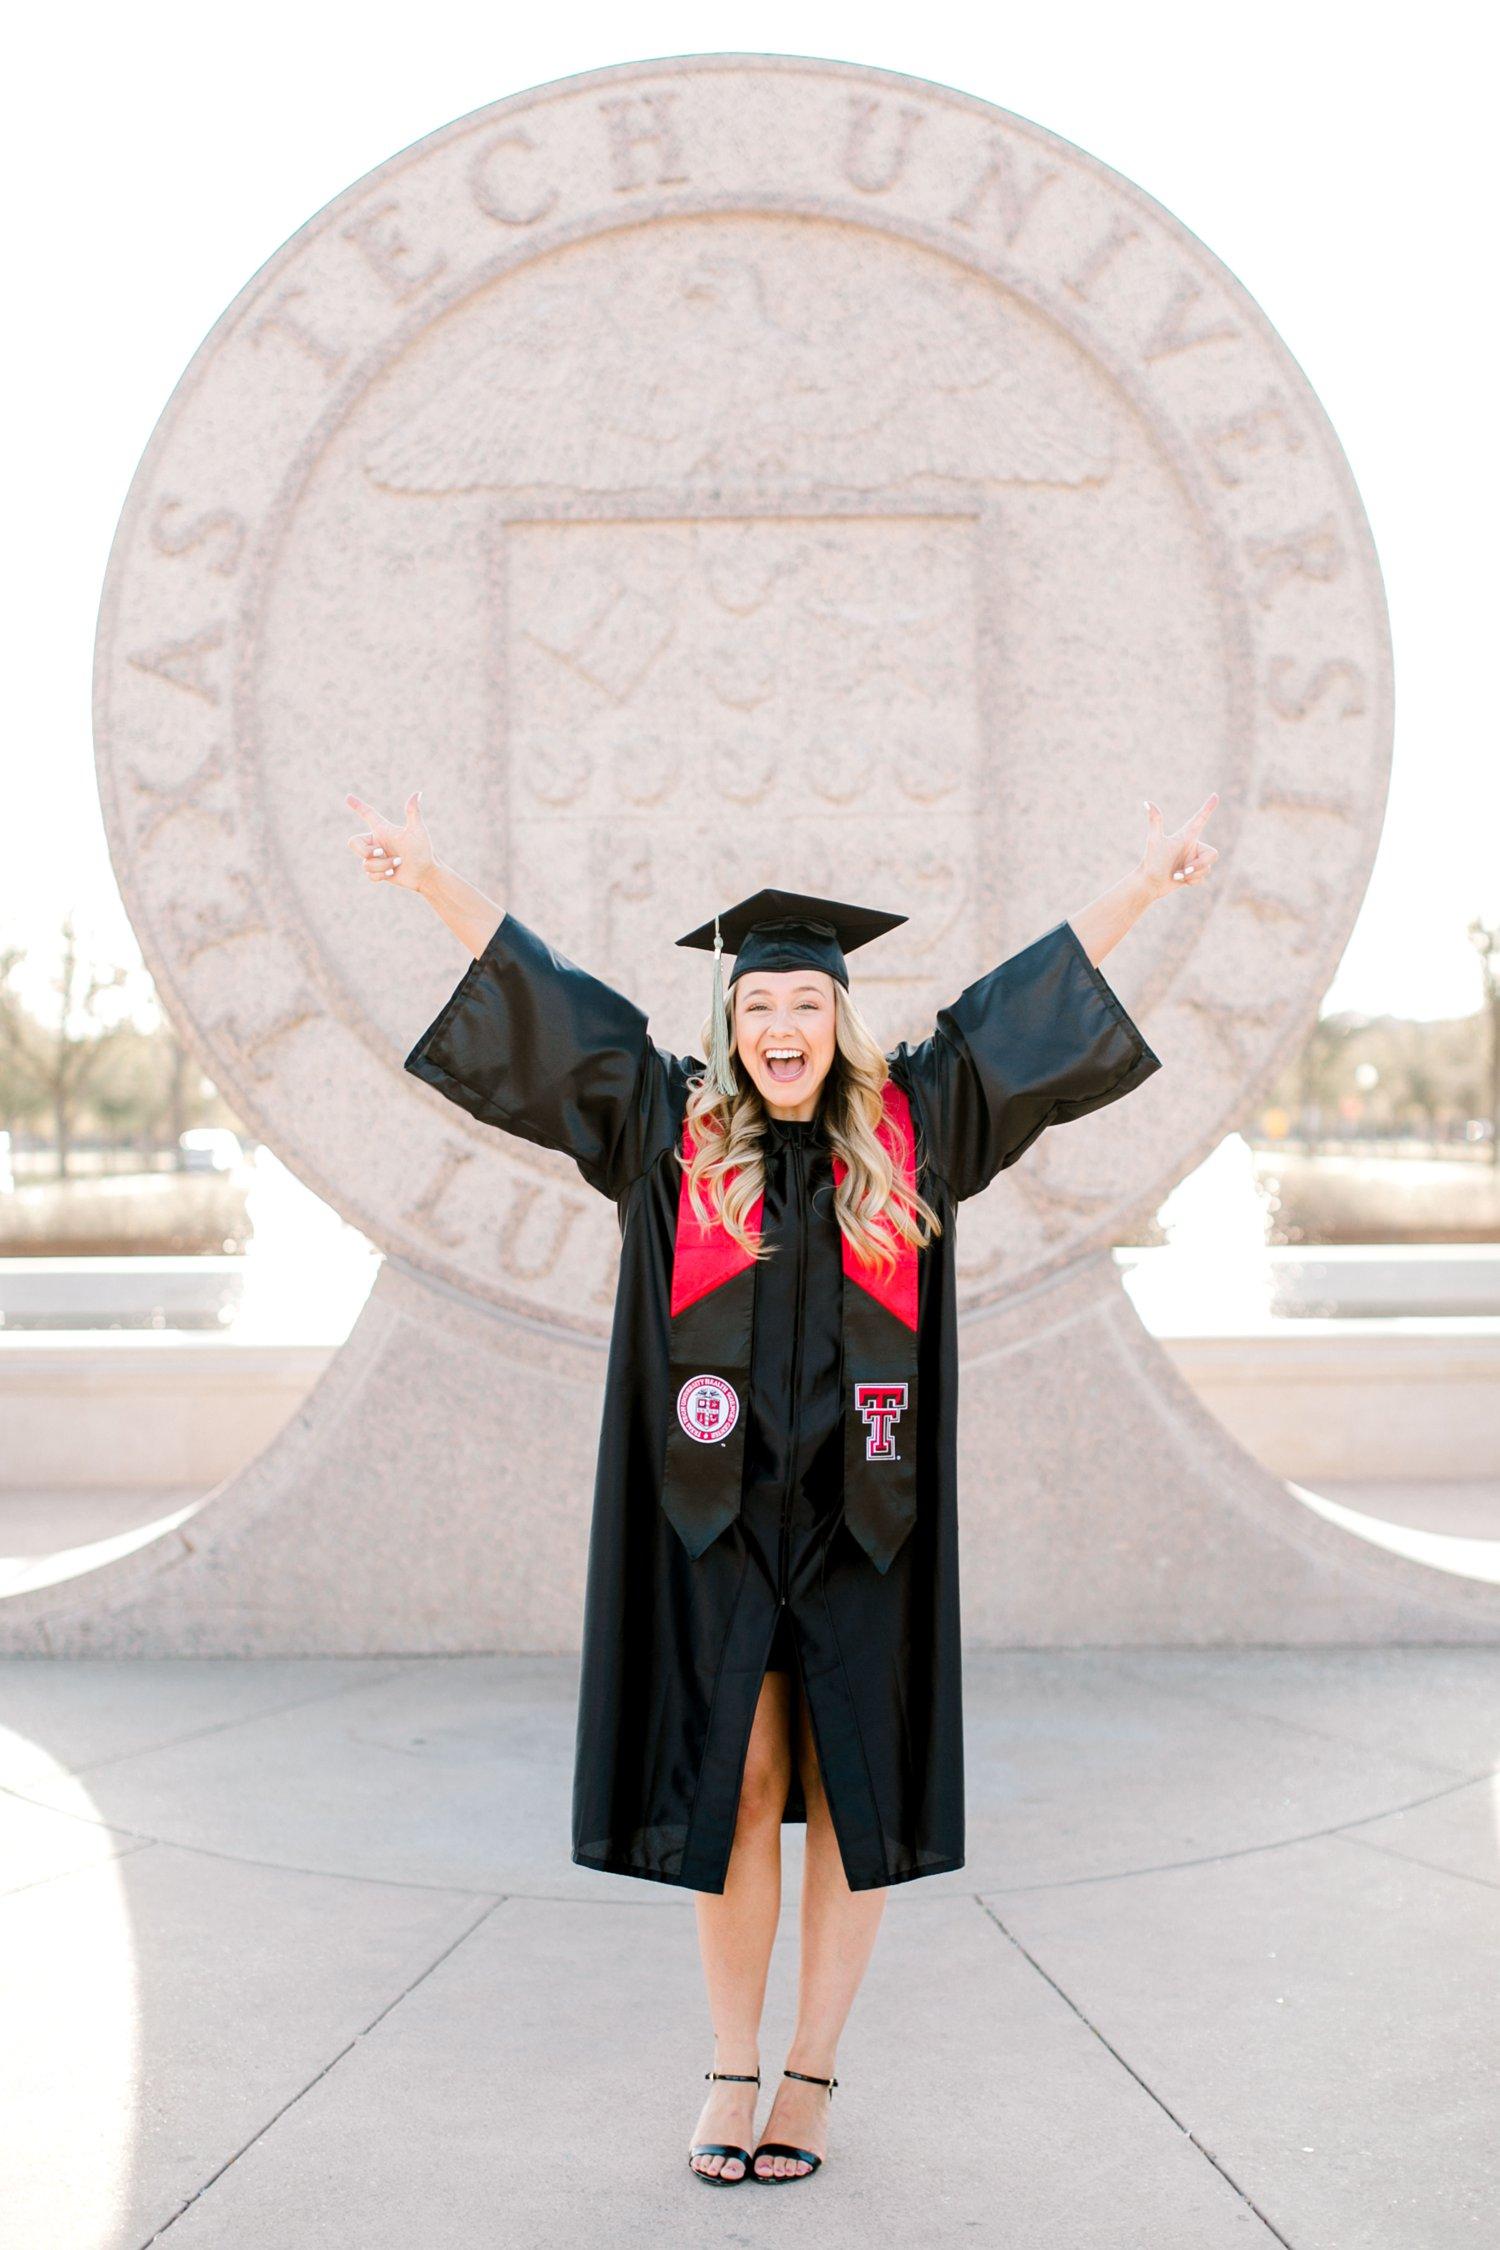 Bailey-shephard-texas-tech-university-lubbock-senior-photographer_0001.jpg